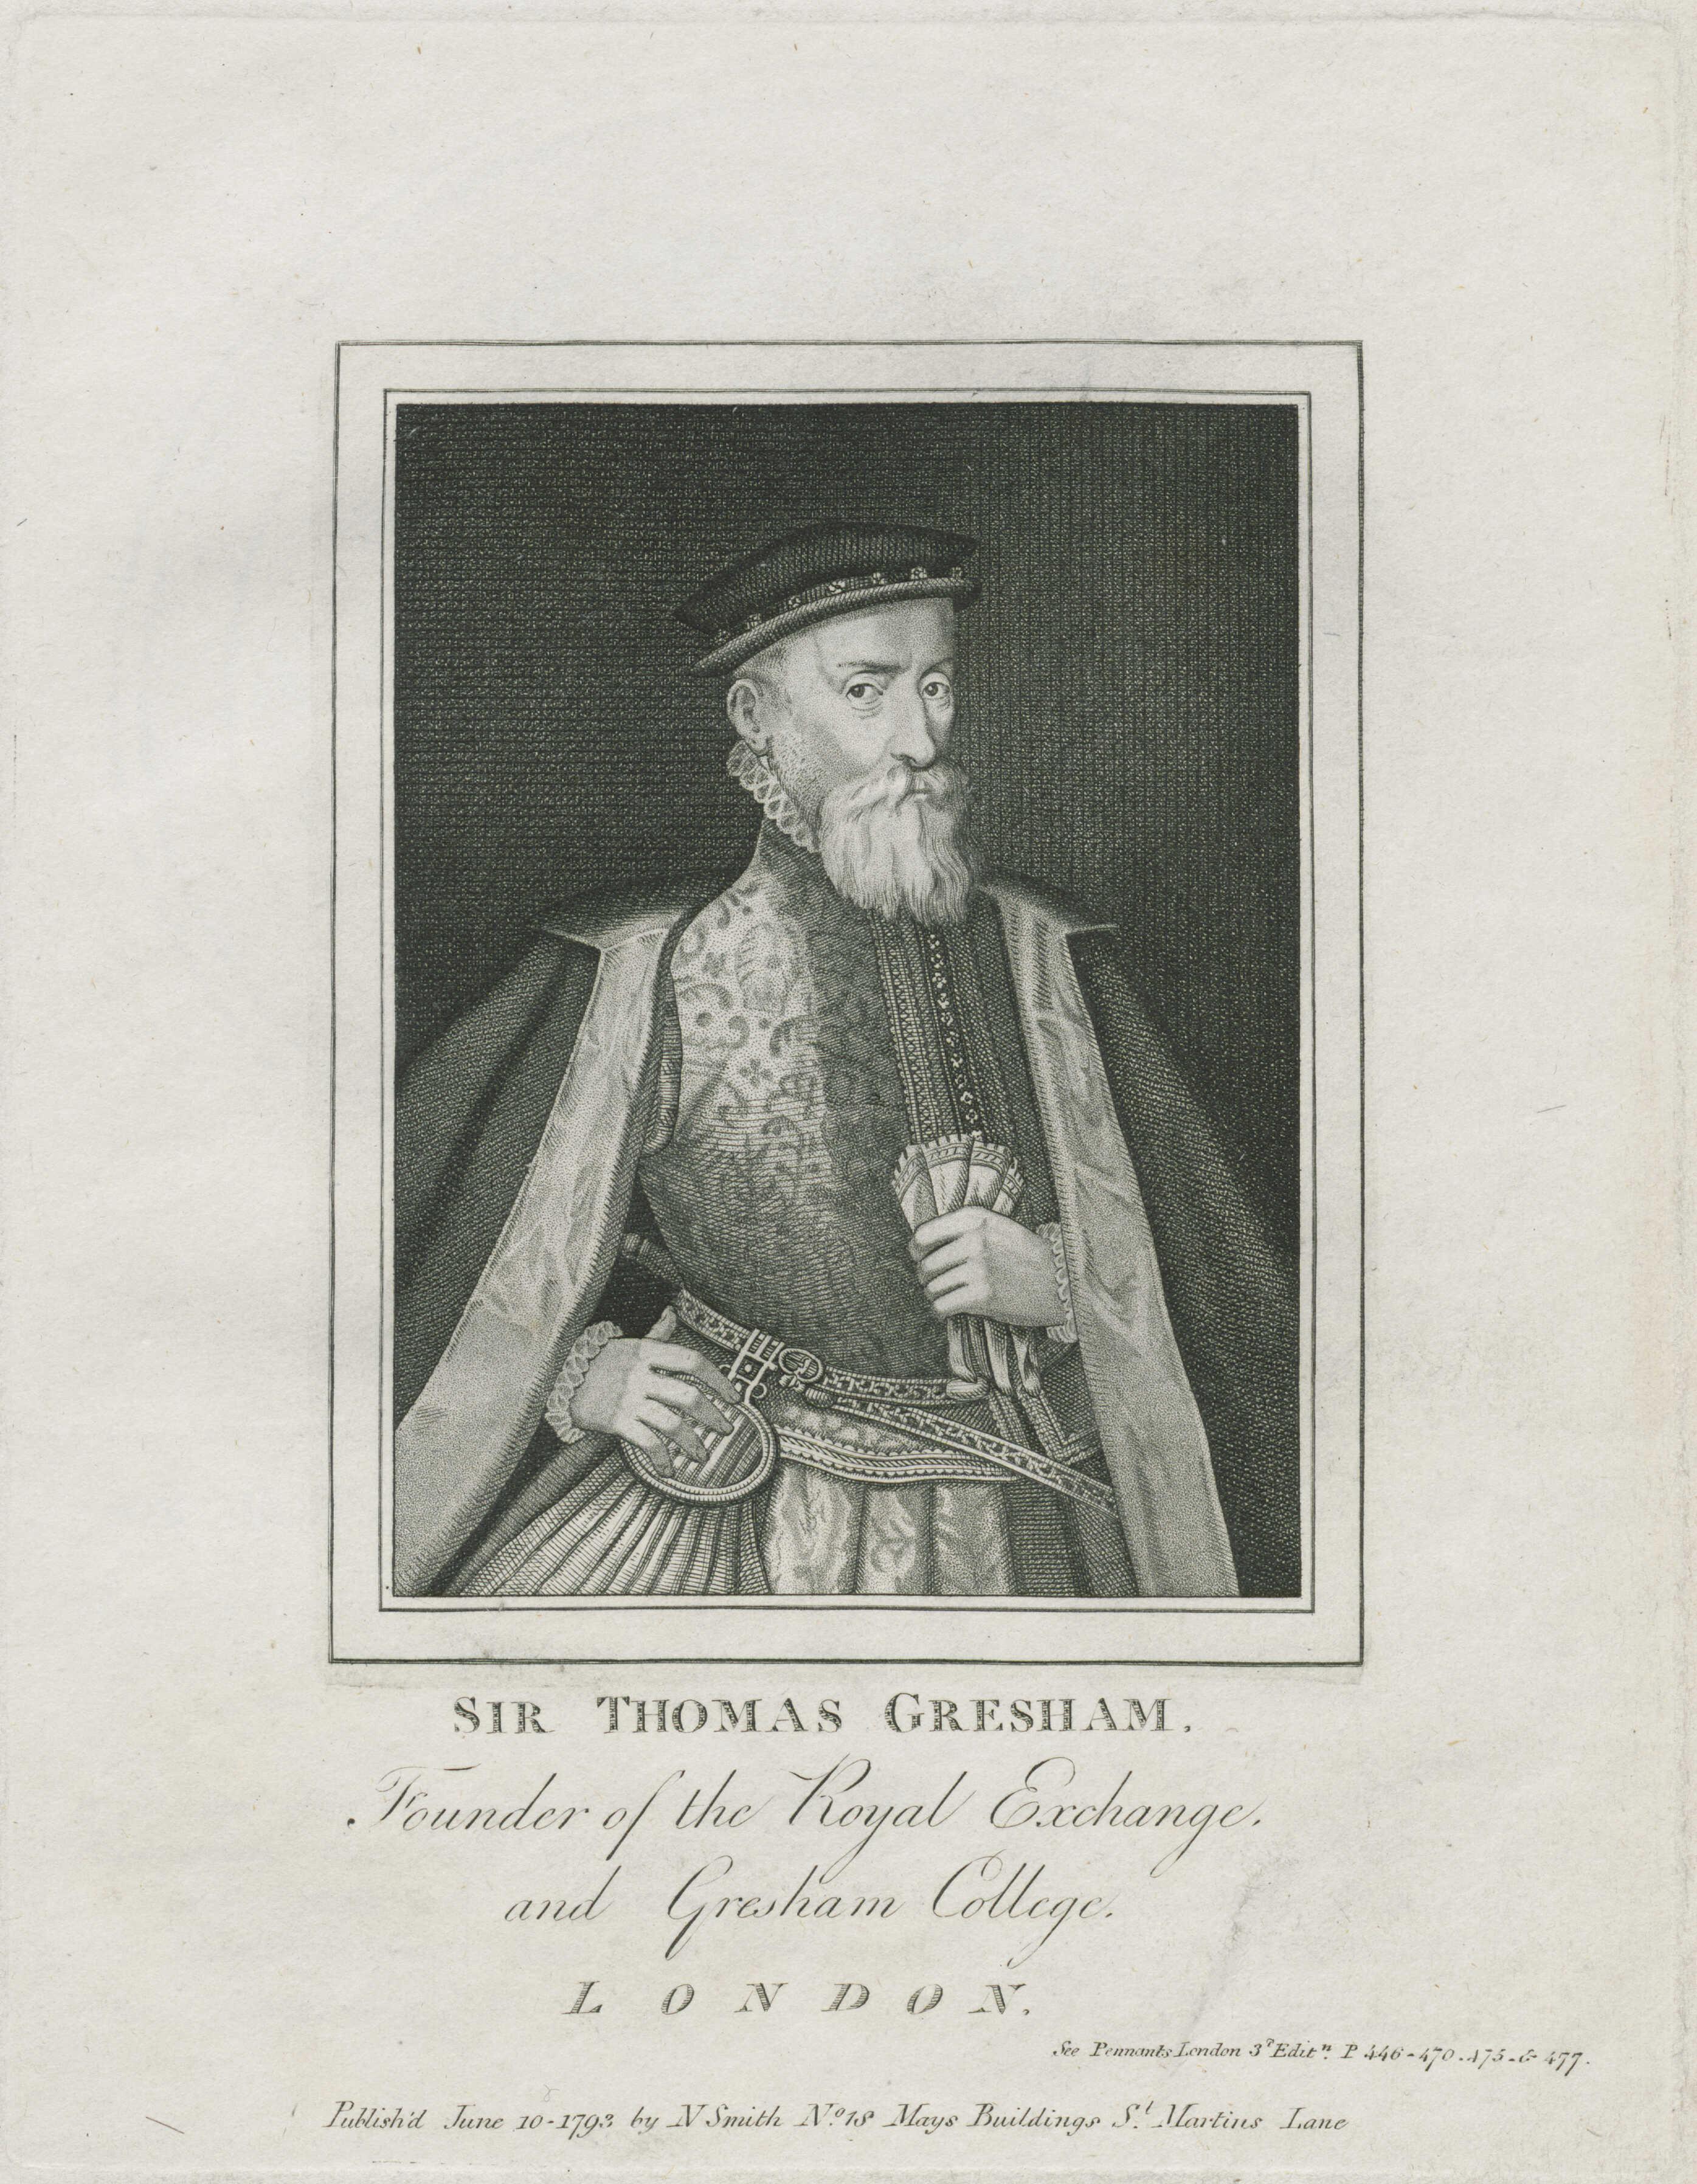 45-sir-thomas-gresham-founder-of-the-royal-exchange-and-gresham-college